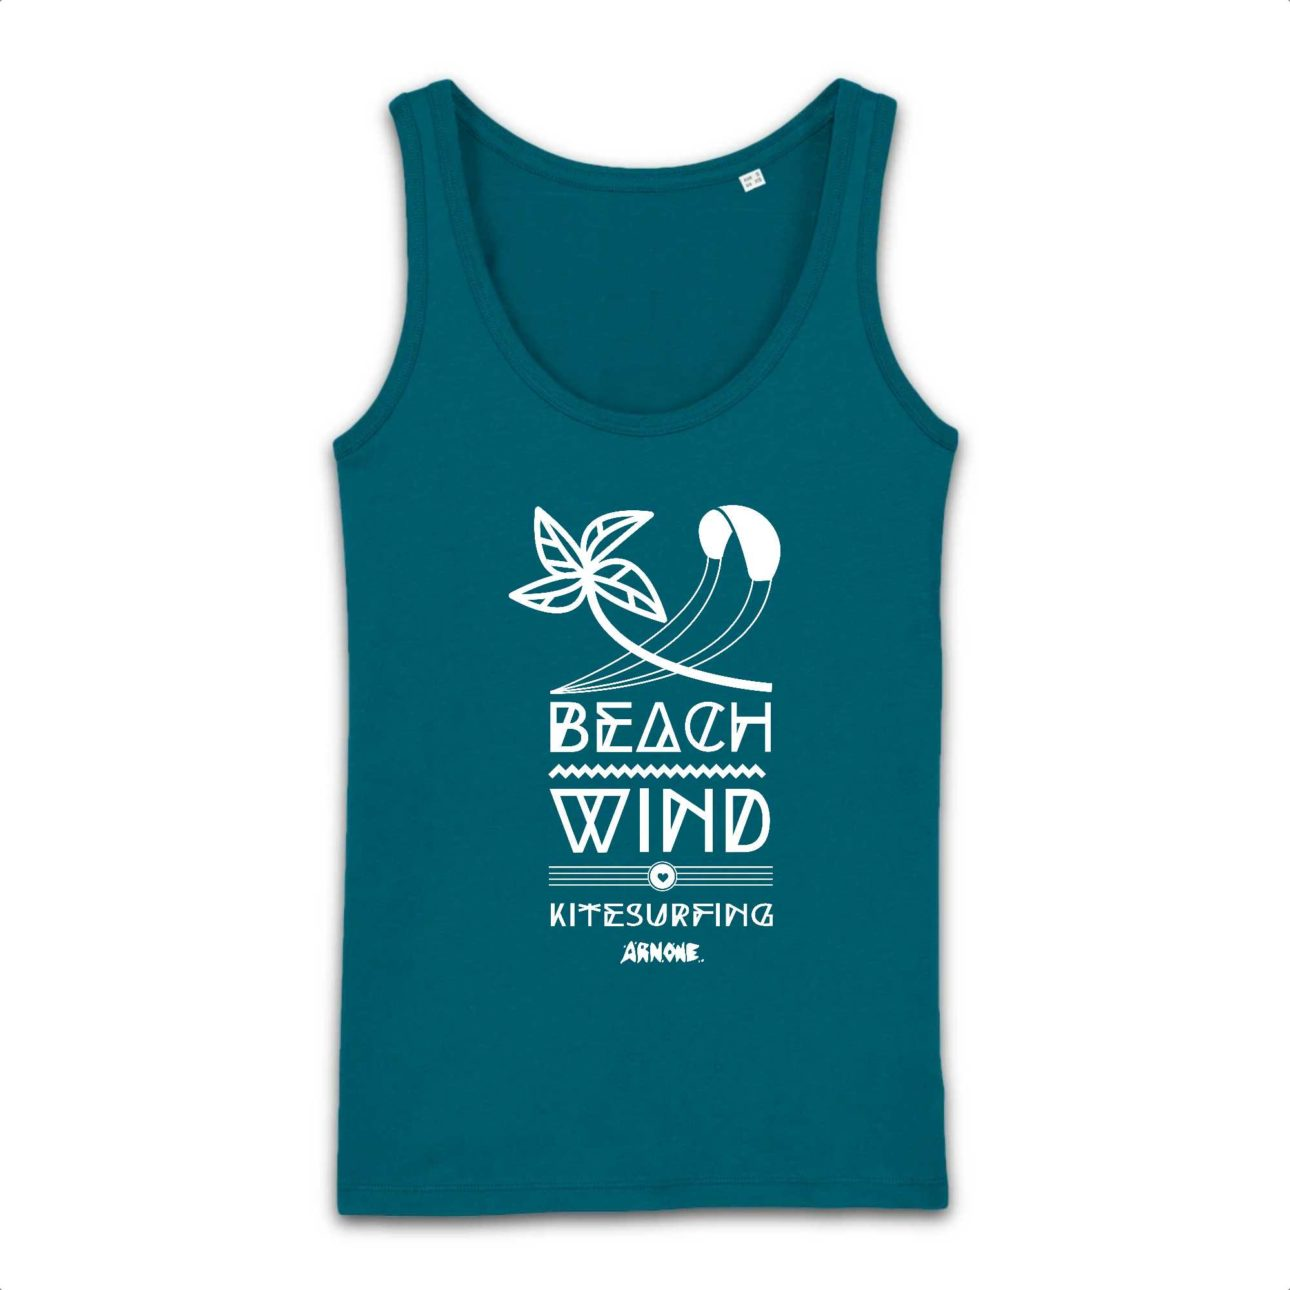 Beach Wind Kitesurfing